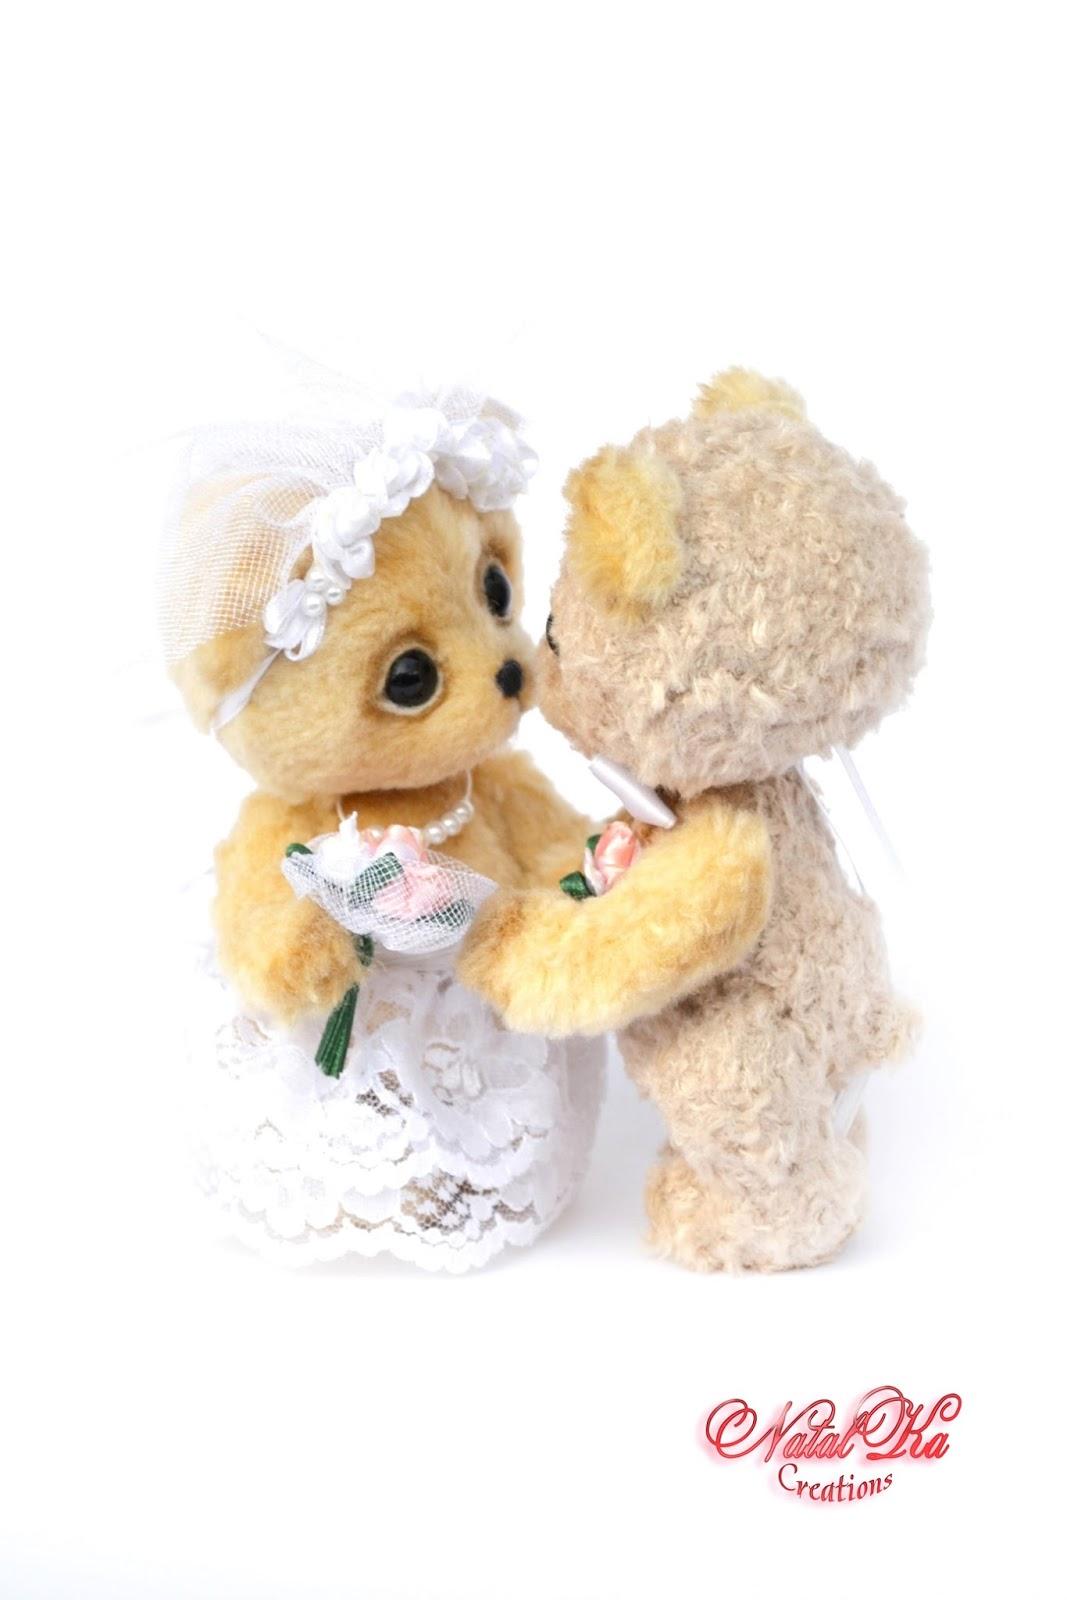 Авторские медведи тедди, свадебная пара, жених и невеста, медвежата тедди, мишки тедди, ручная работа от NatalKa Creations. Artist teddy bears, teddies with charm, bride and groom, artist bears, bers jointed, wedding bears, ooak, bears from silk, handmade by NatalKa Creations.